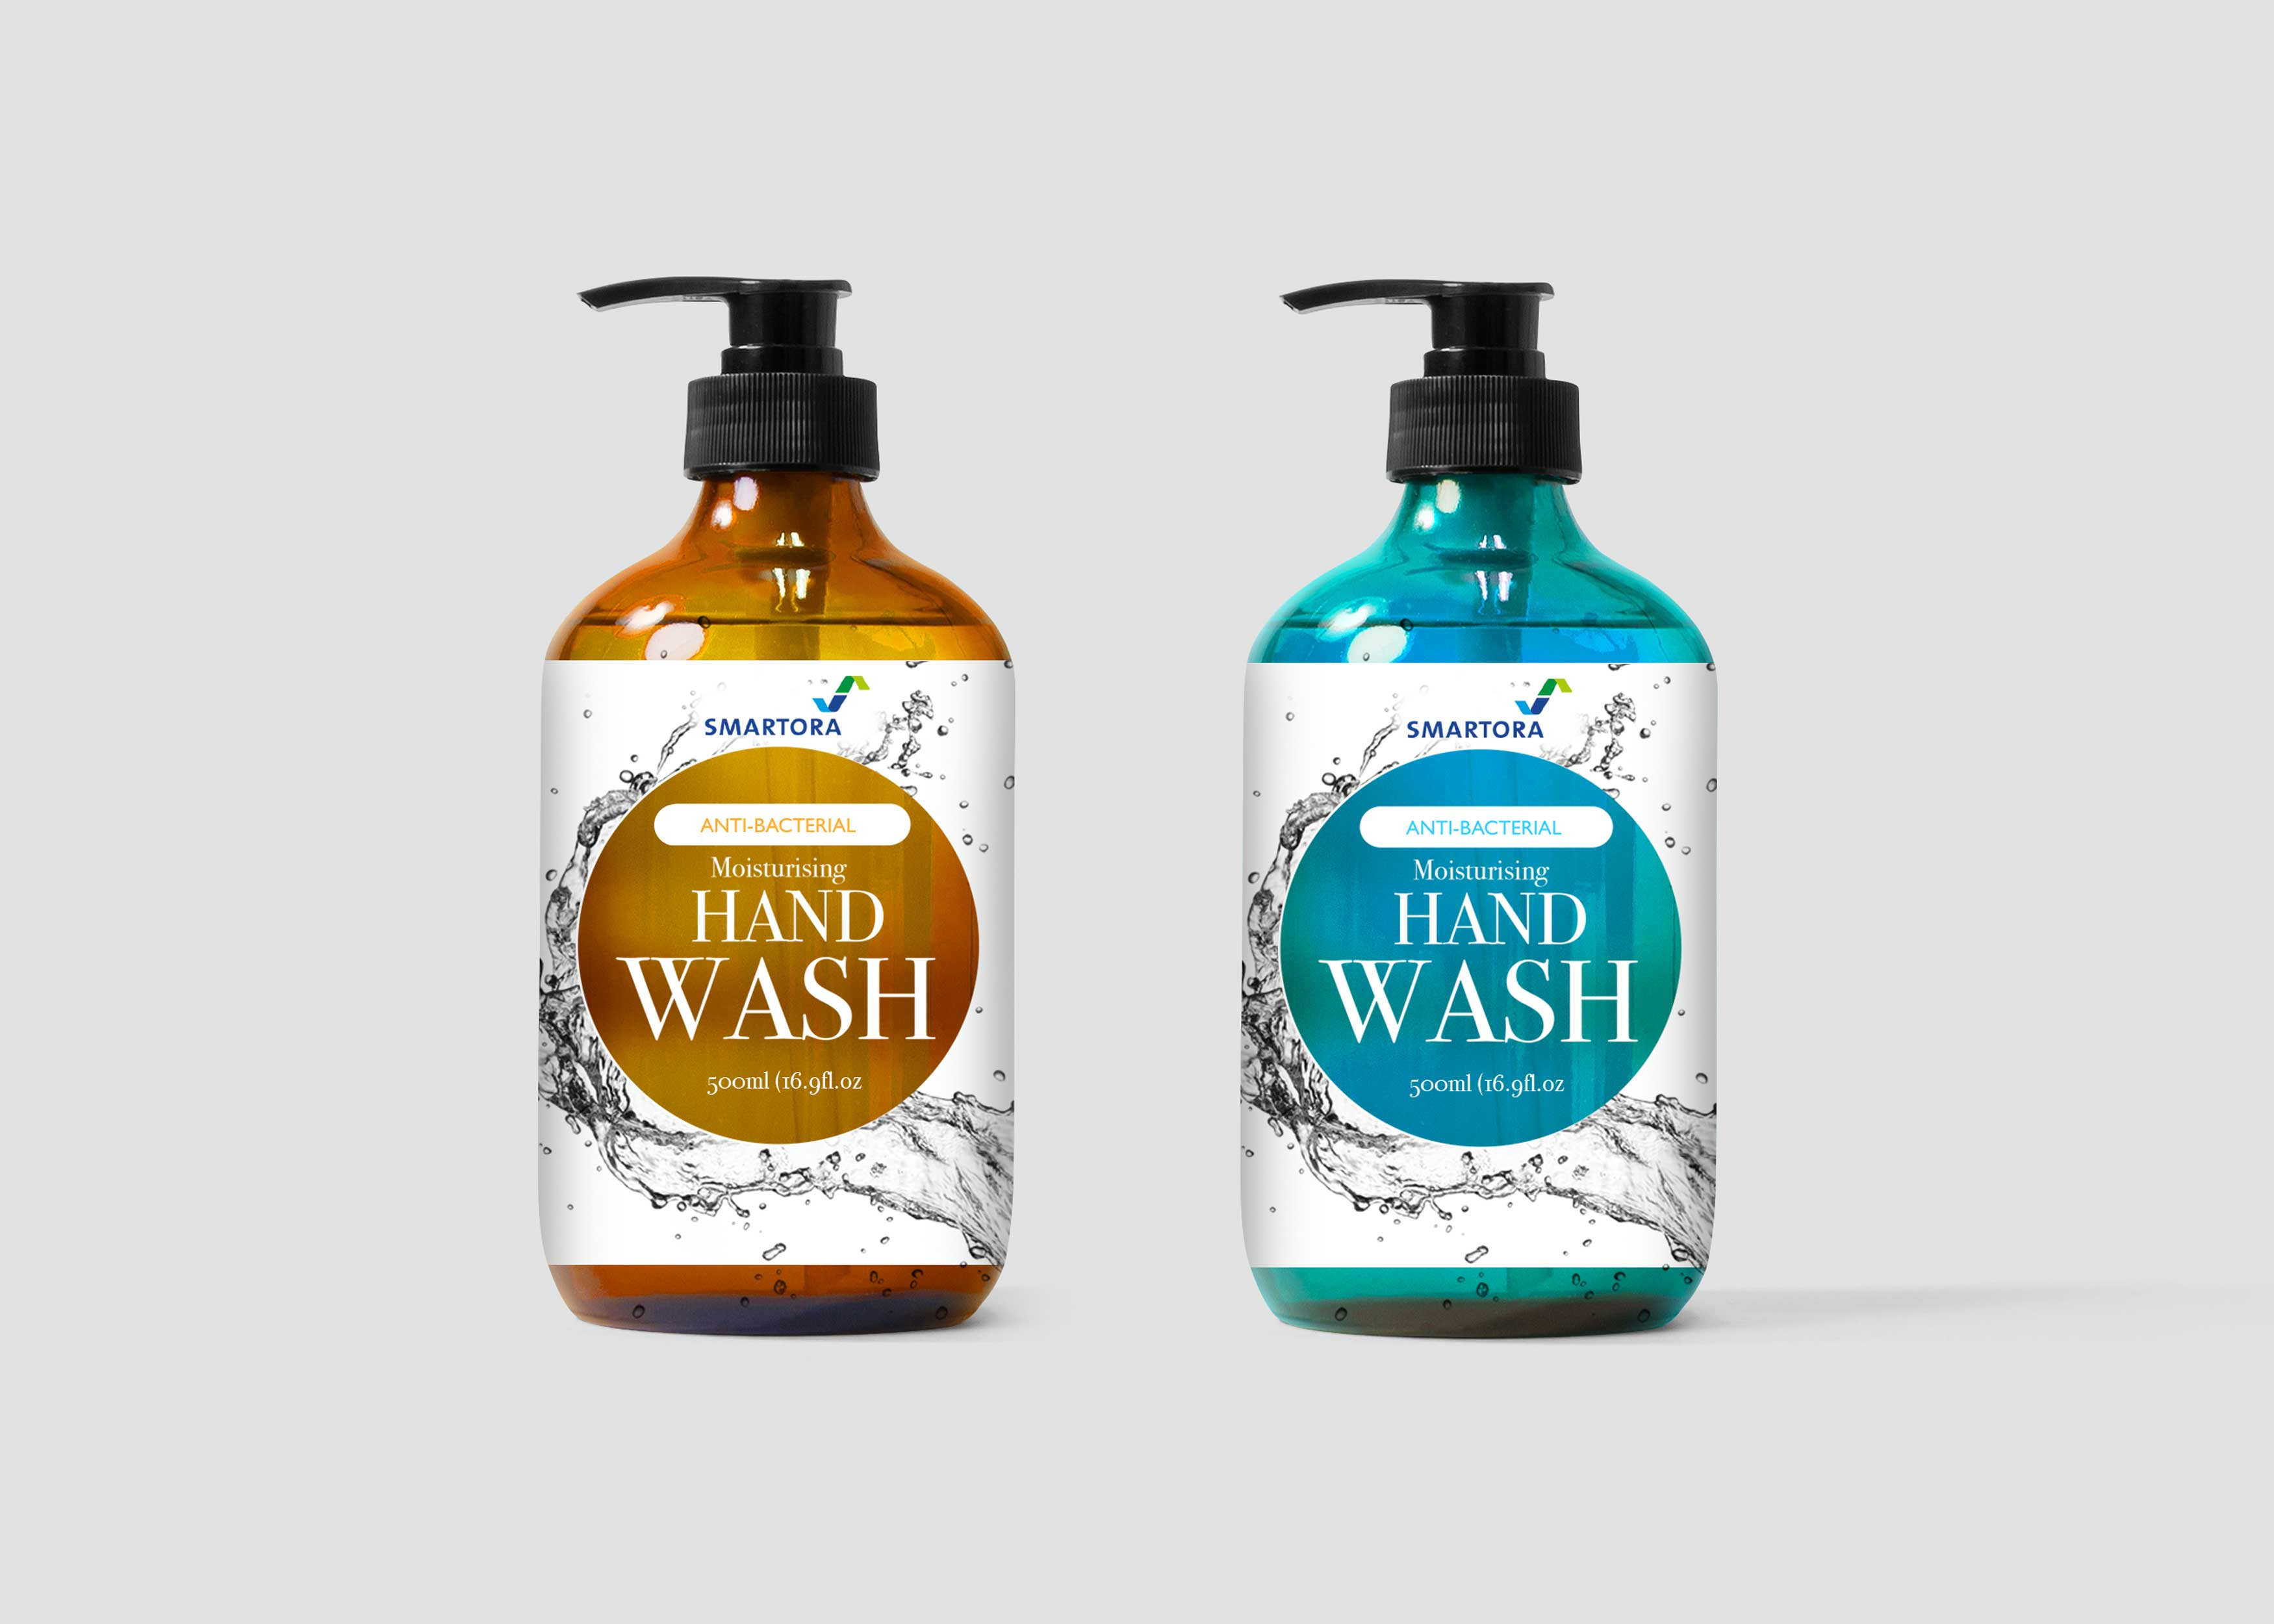 smartora-hand-wash-packaging